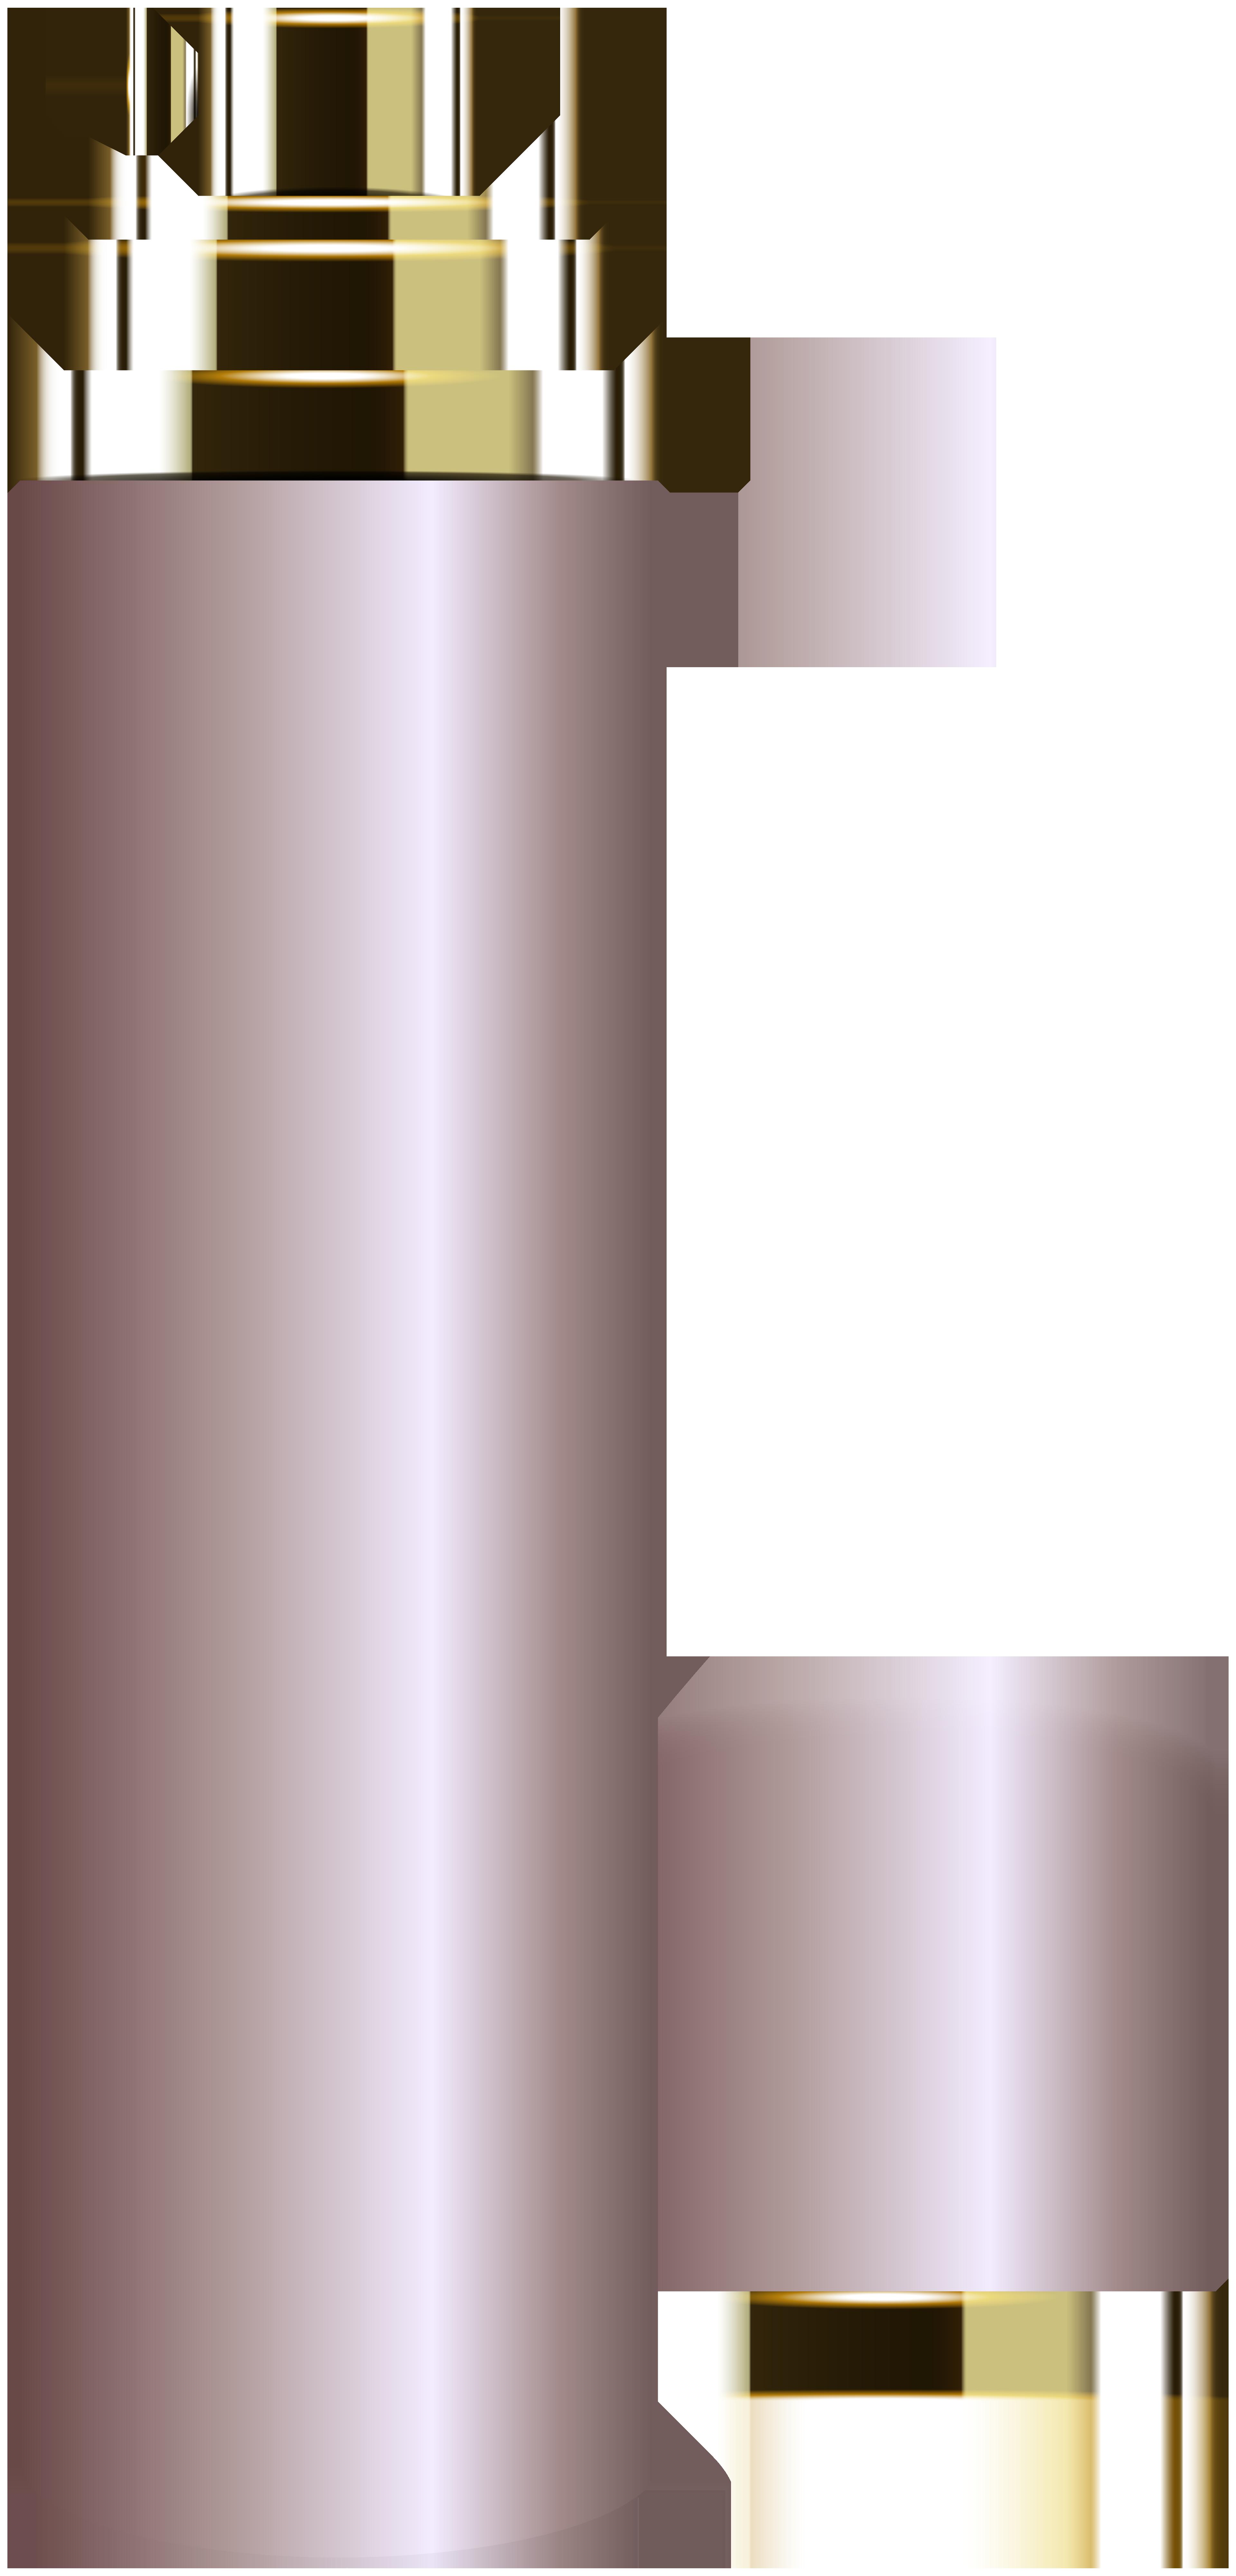 Perfume clip art image. Spray bottle png